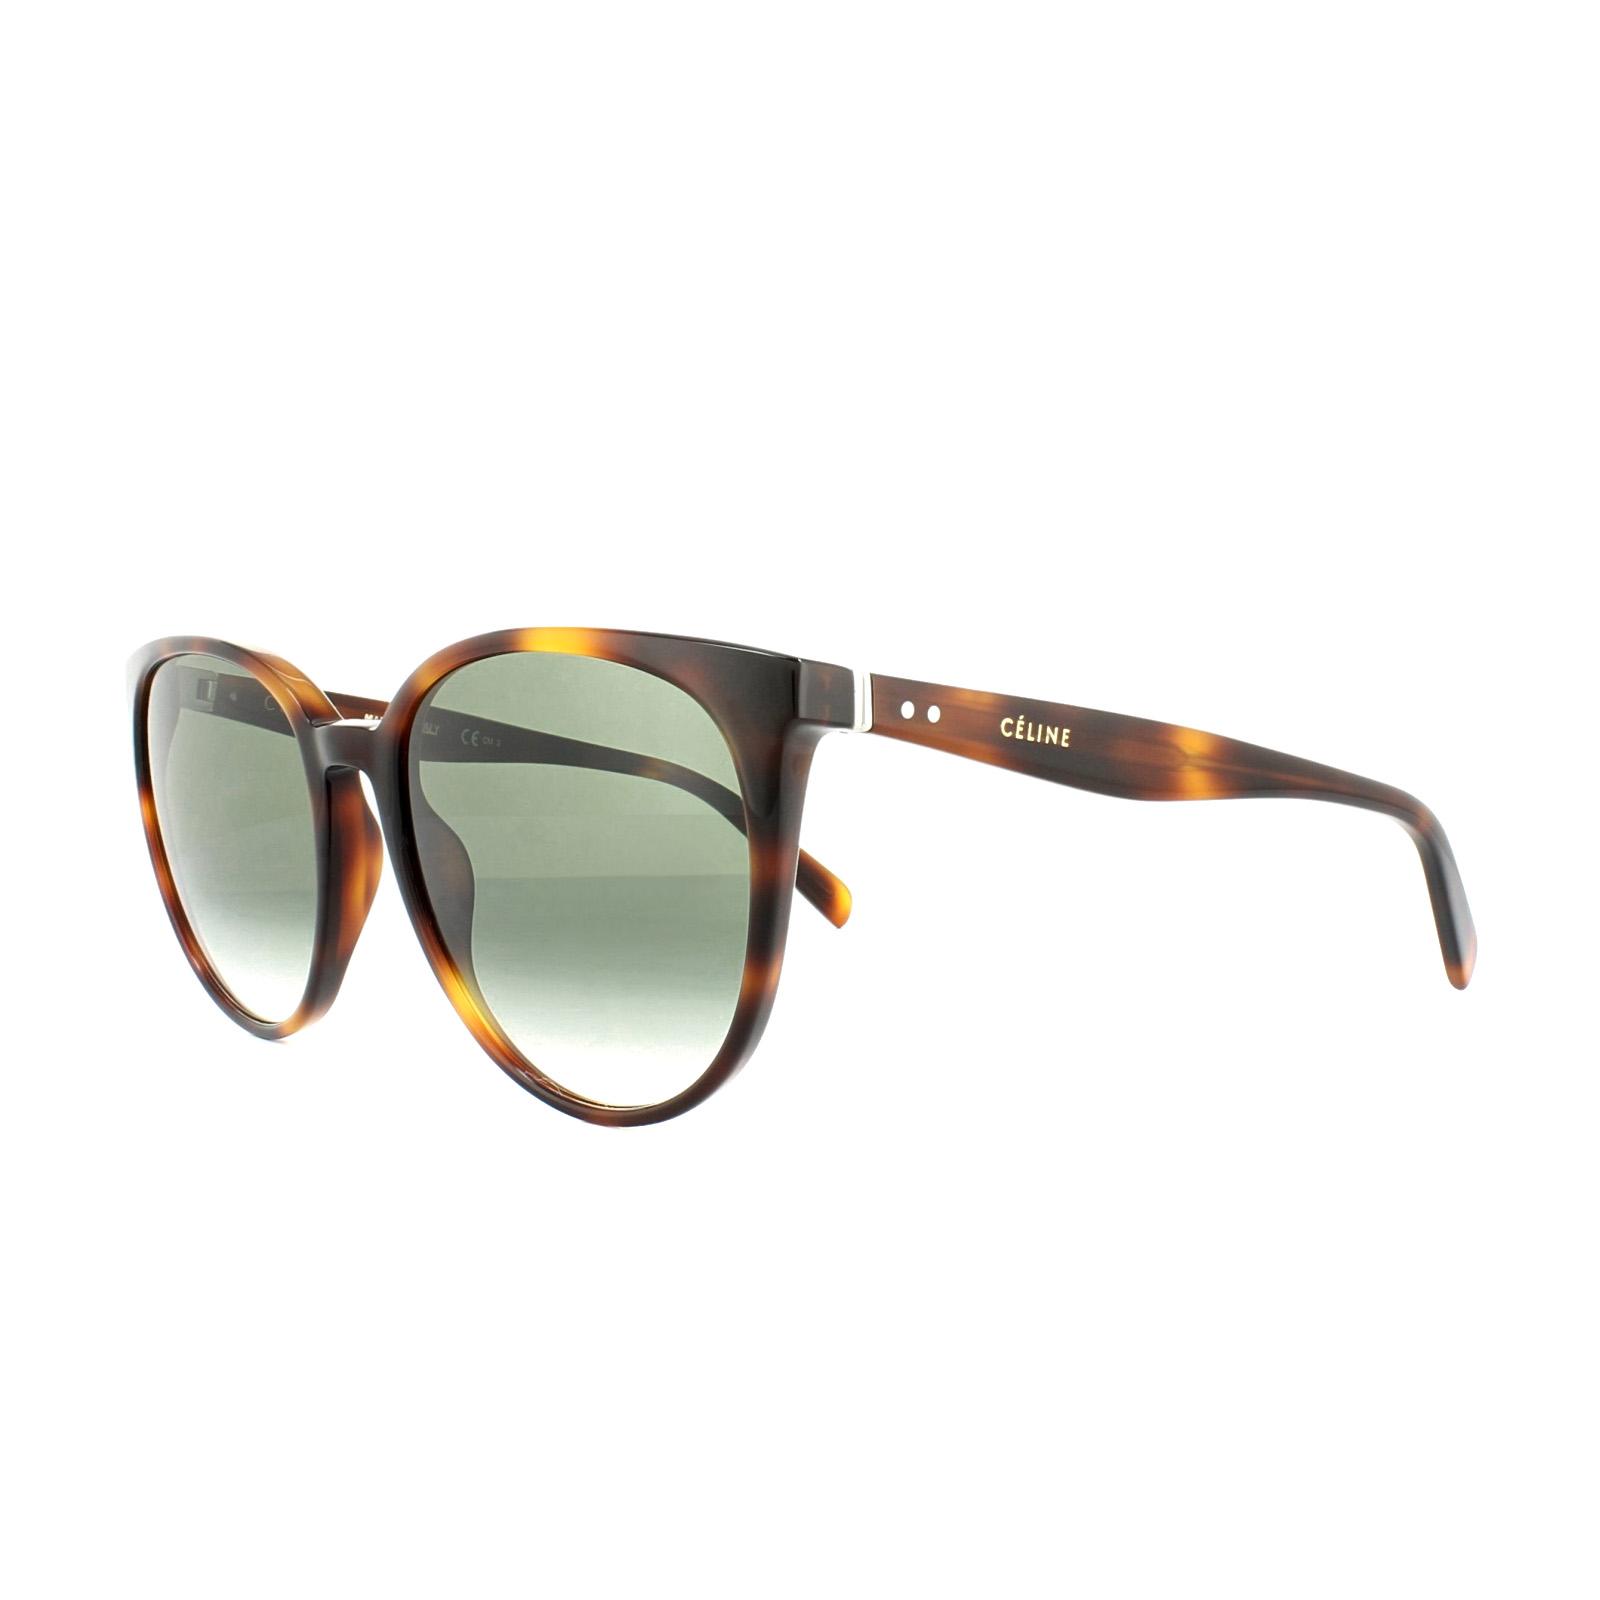 d86762960f70 Sentinel Celine Sunglasses 41068 S Thin Mary 05L XM Havana Green Gradient